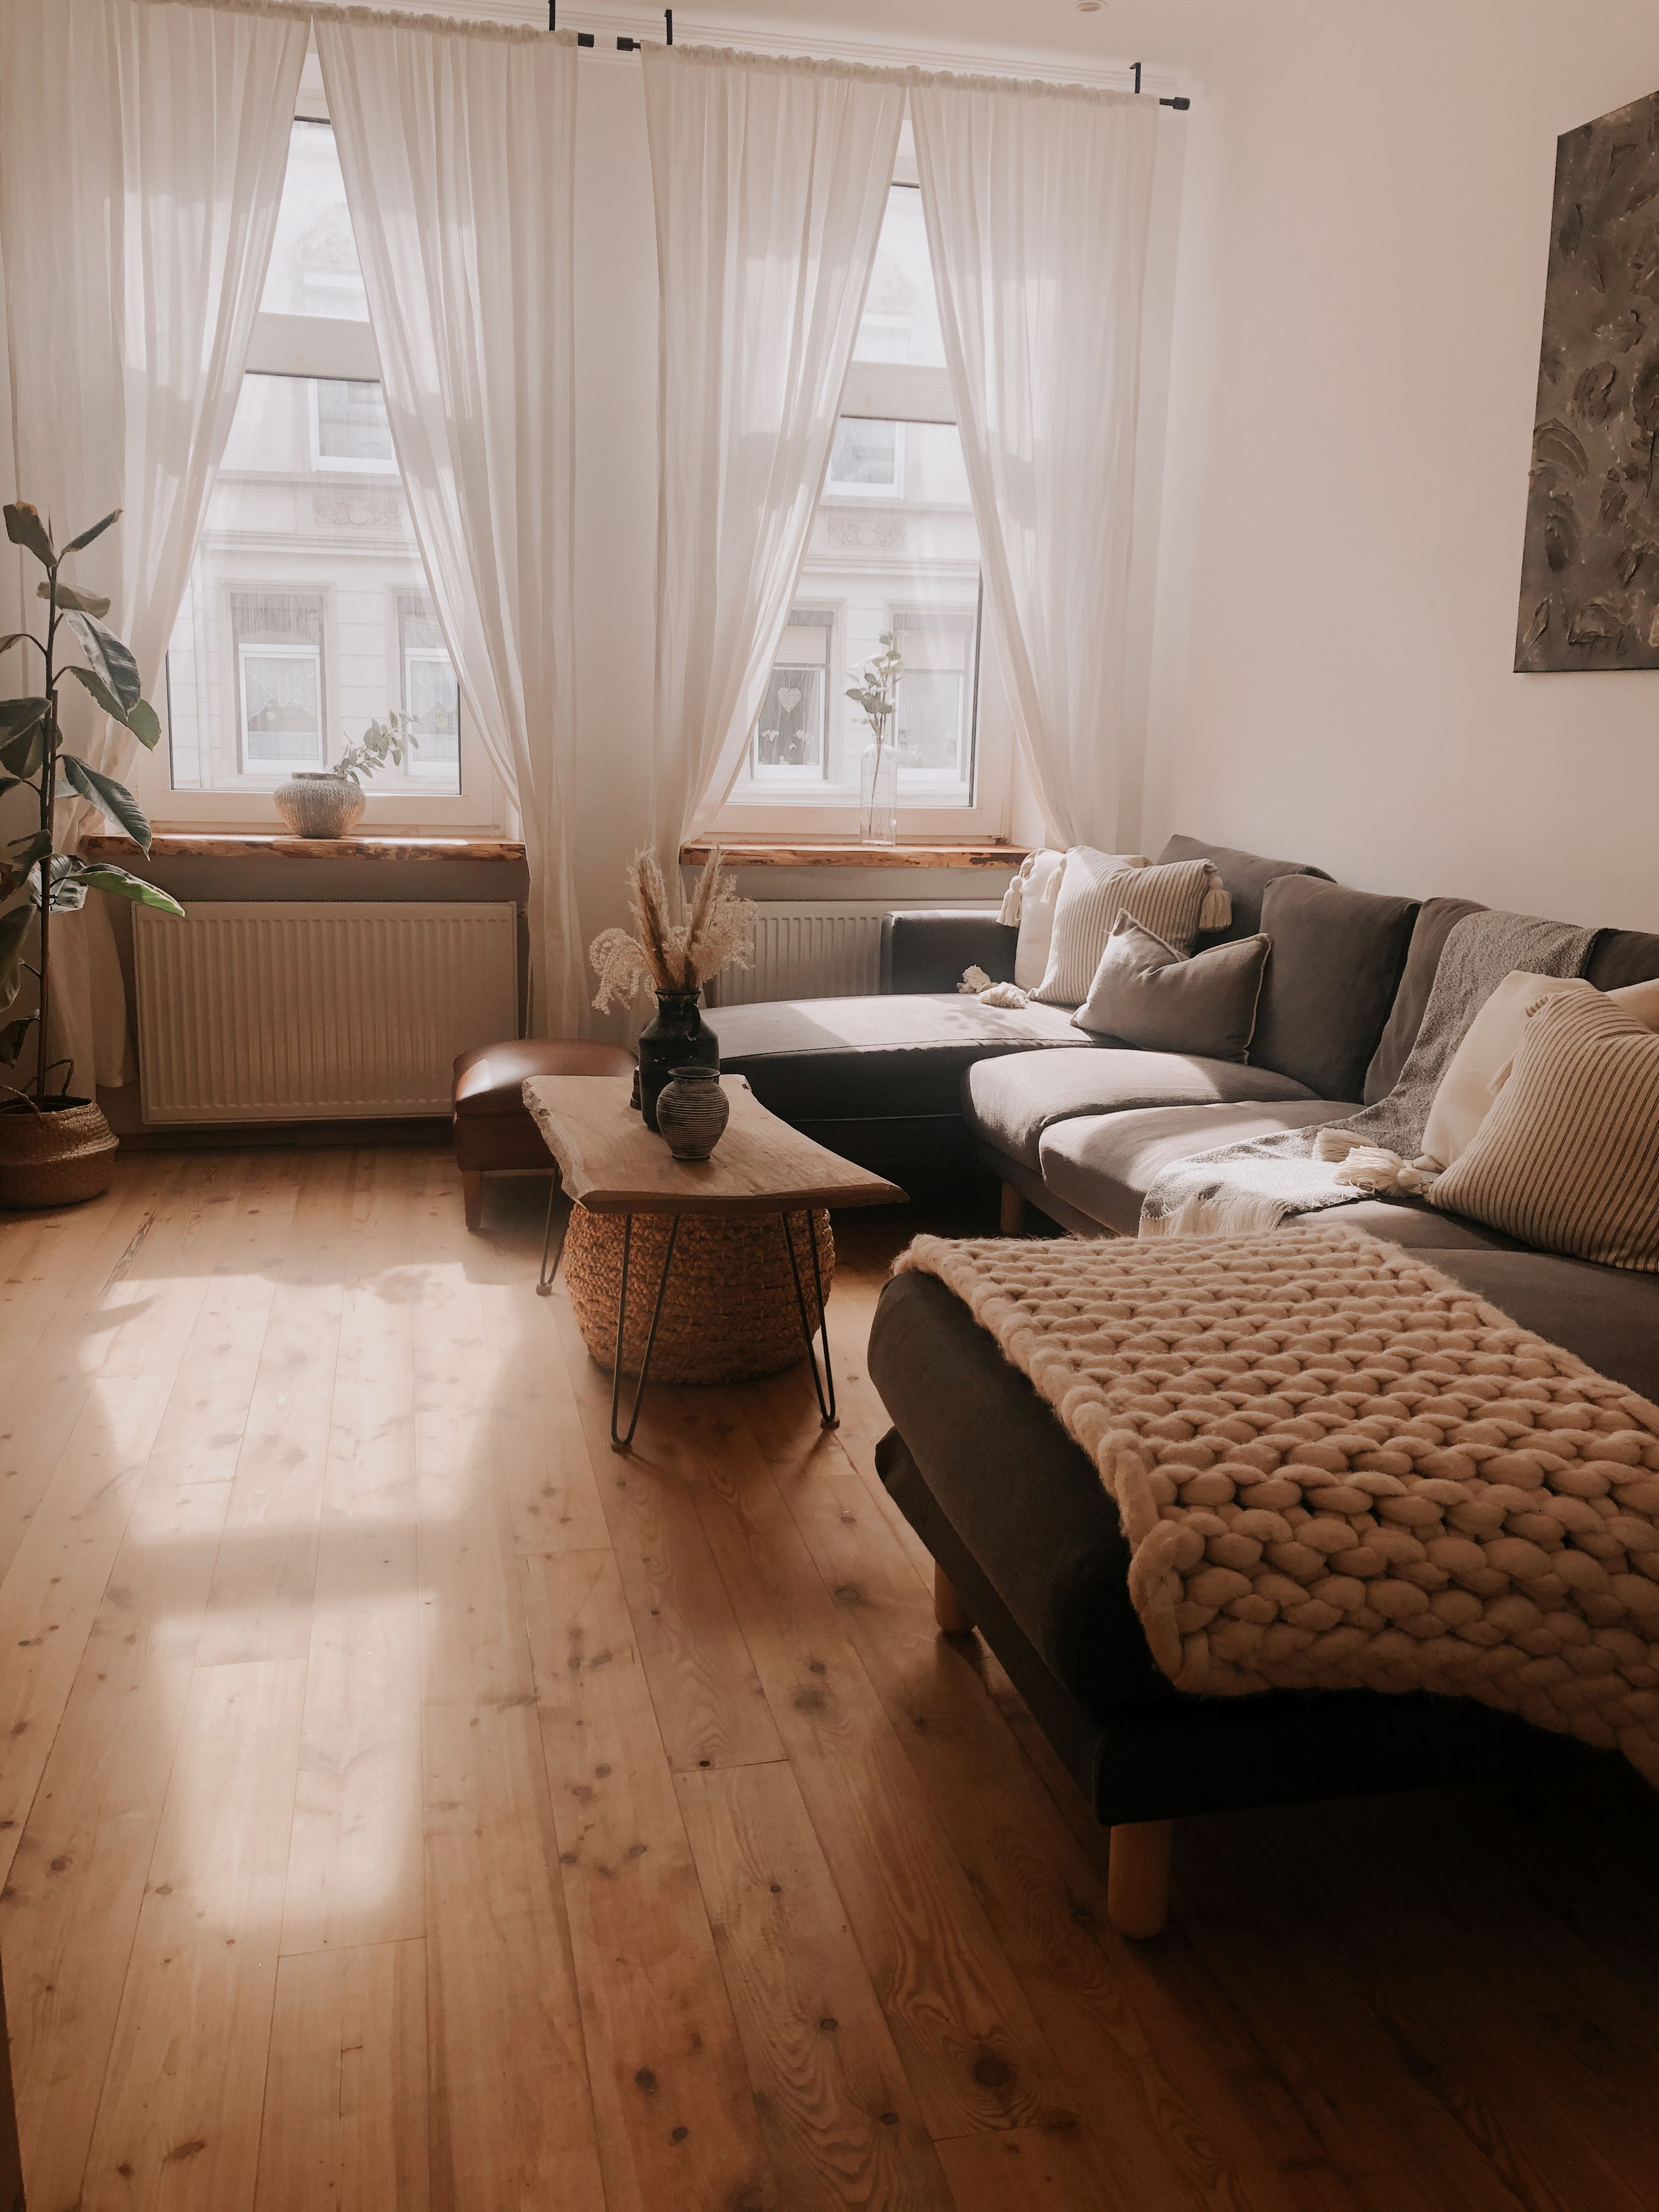 #cozylivingroom #knittedblanket #cozyhome #smalllivingroom